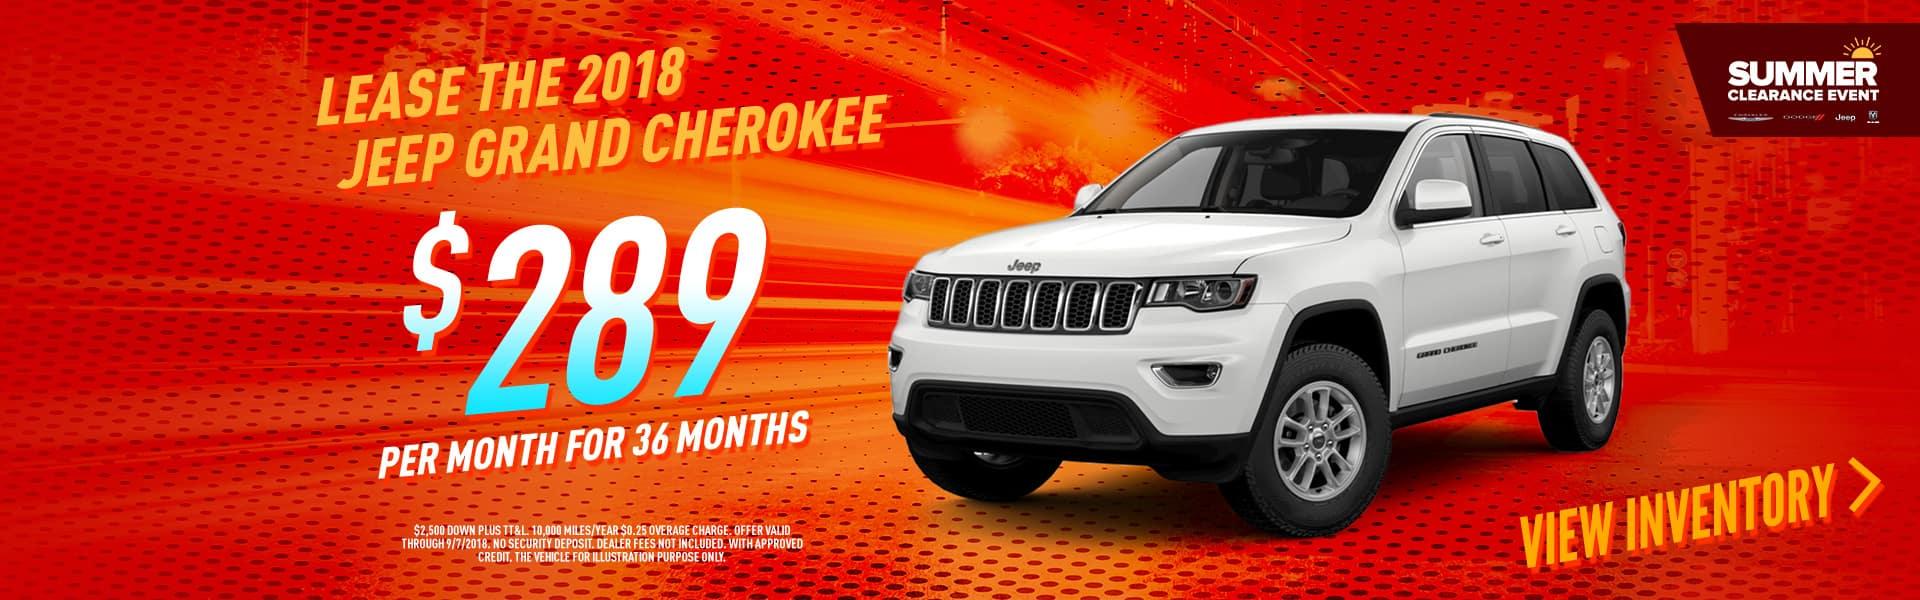 deals-near-me-beaumont-tx-2018-jeep-grand-cherokee